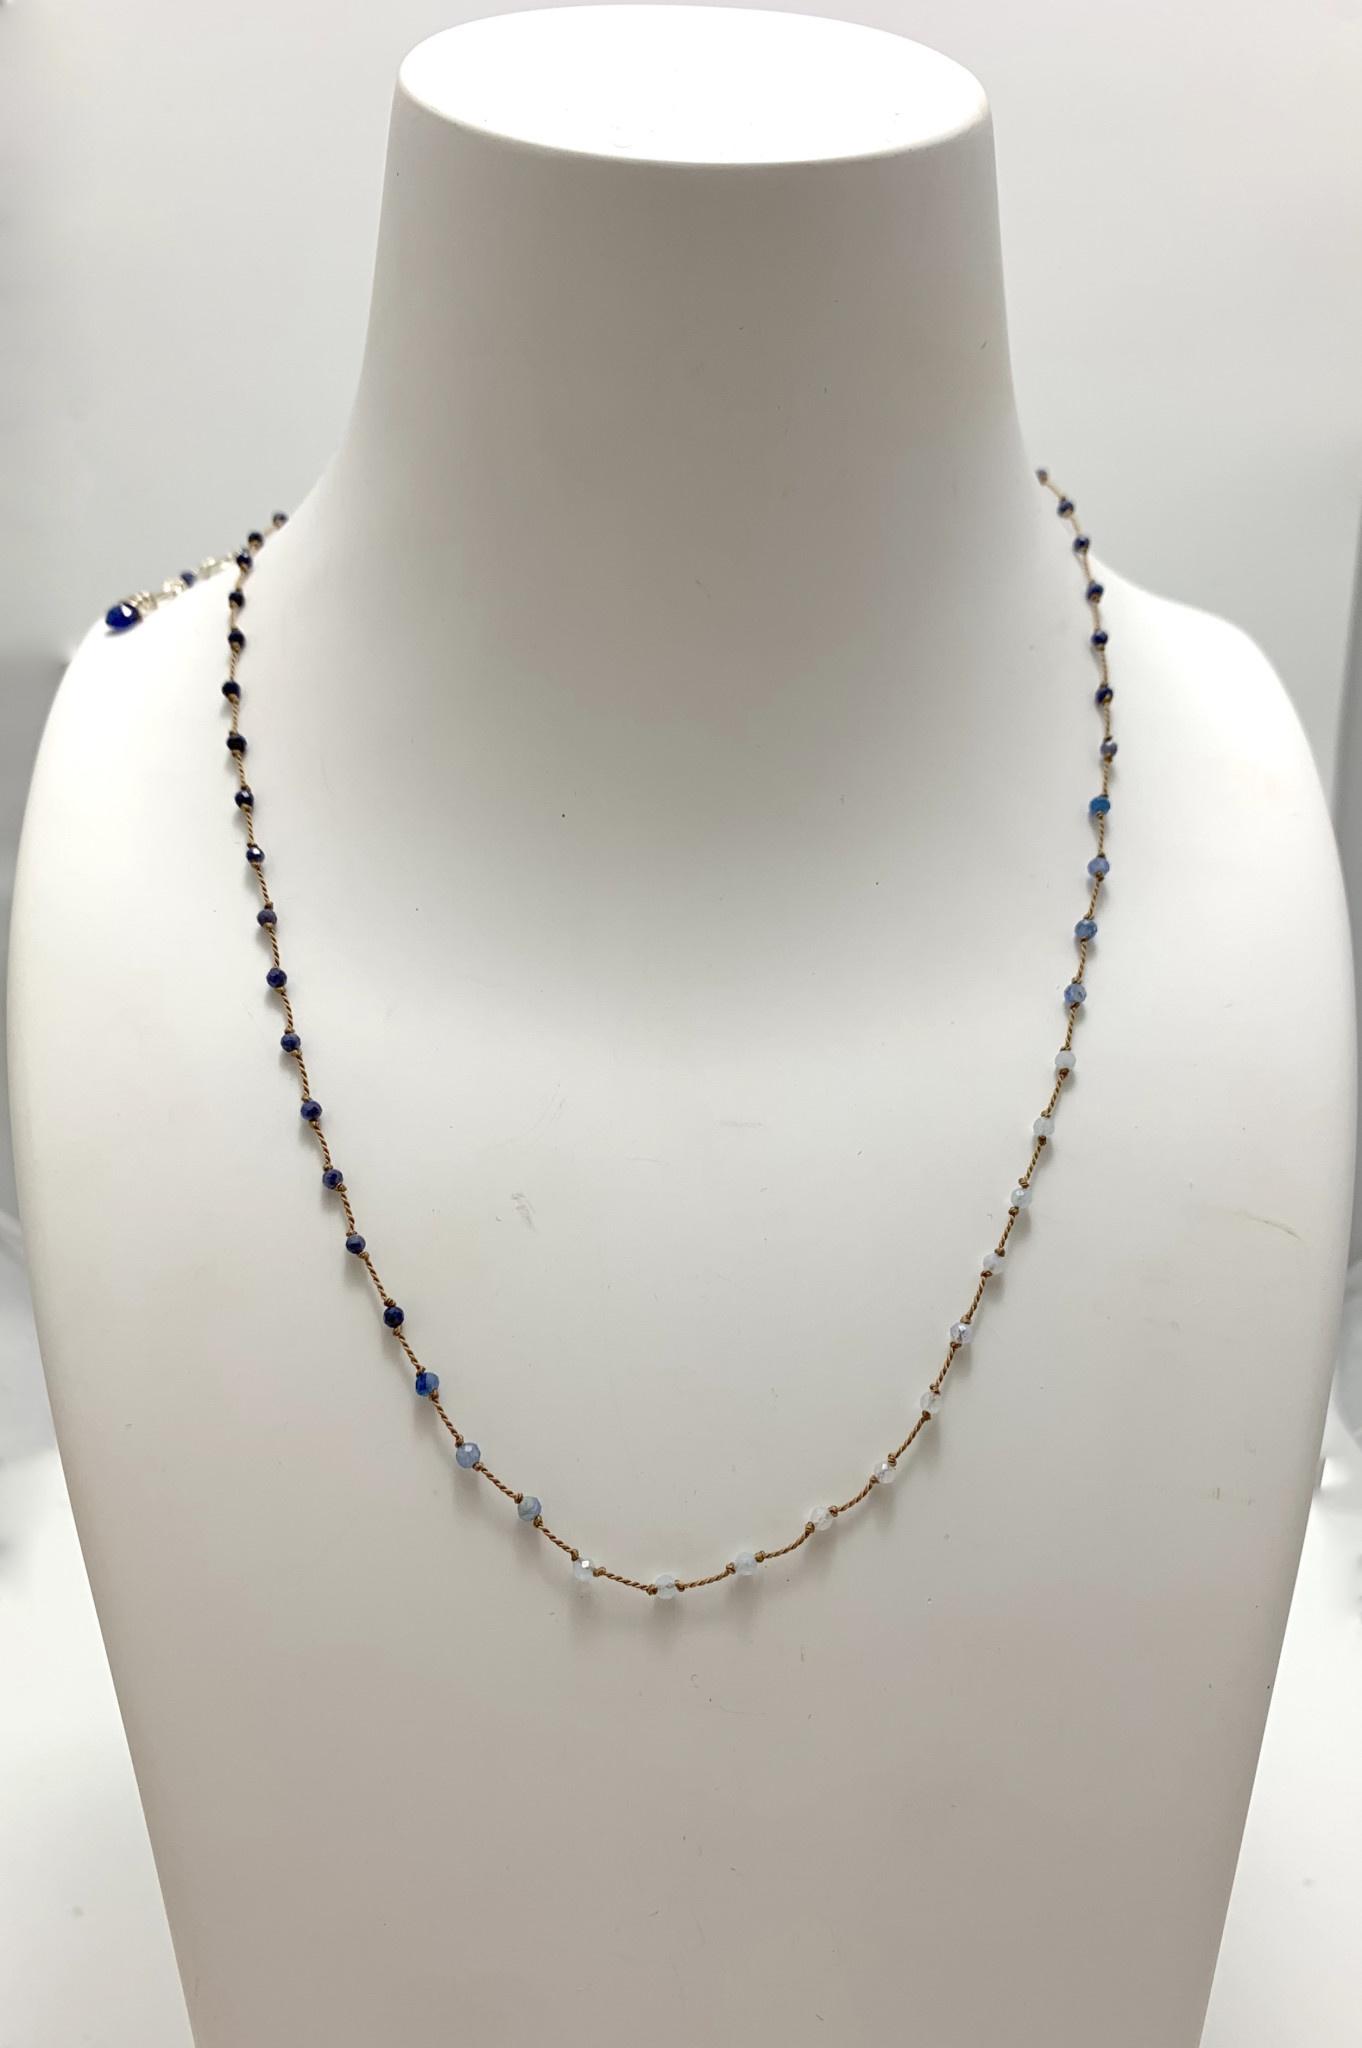 Illusion Micro Sapphire, Kyanite, & Moonstone